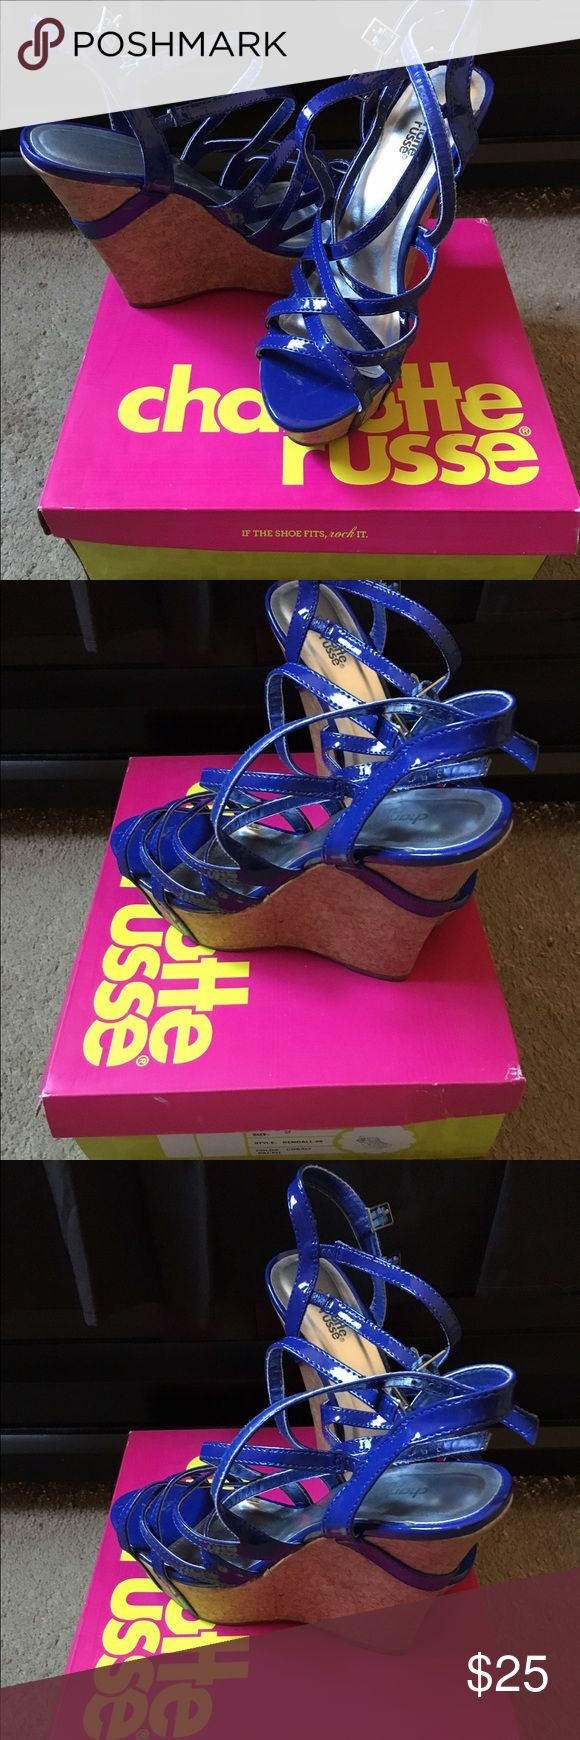 Charlotte Russe cobalt blue wedge sandals Charlotte Russe wedge sandals. Cobalt blue. Size 9. Only worn once. 💙 Charlotte Russe Shoes Wedges